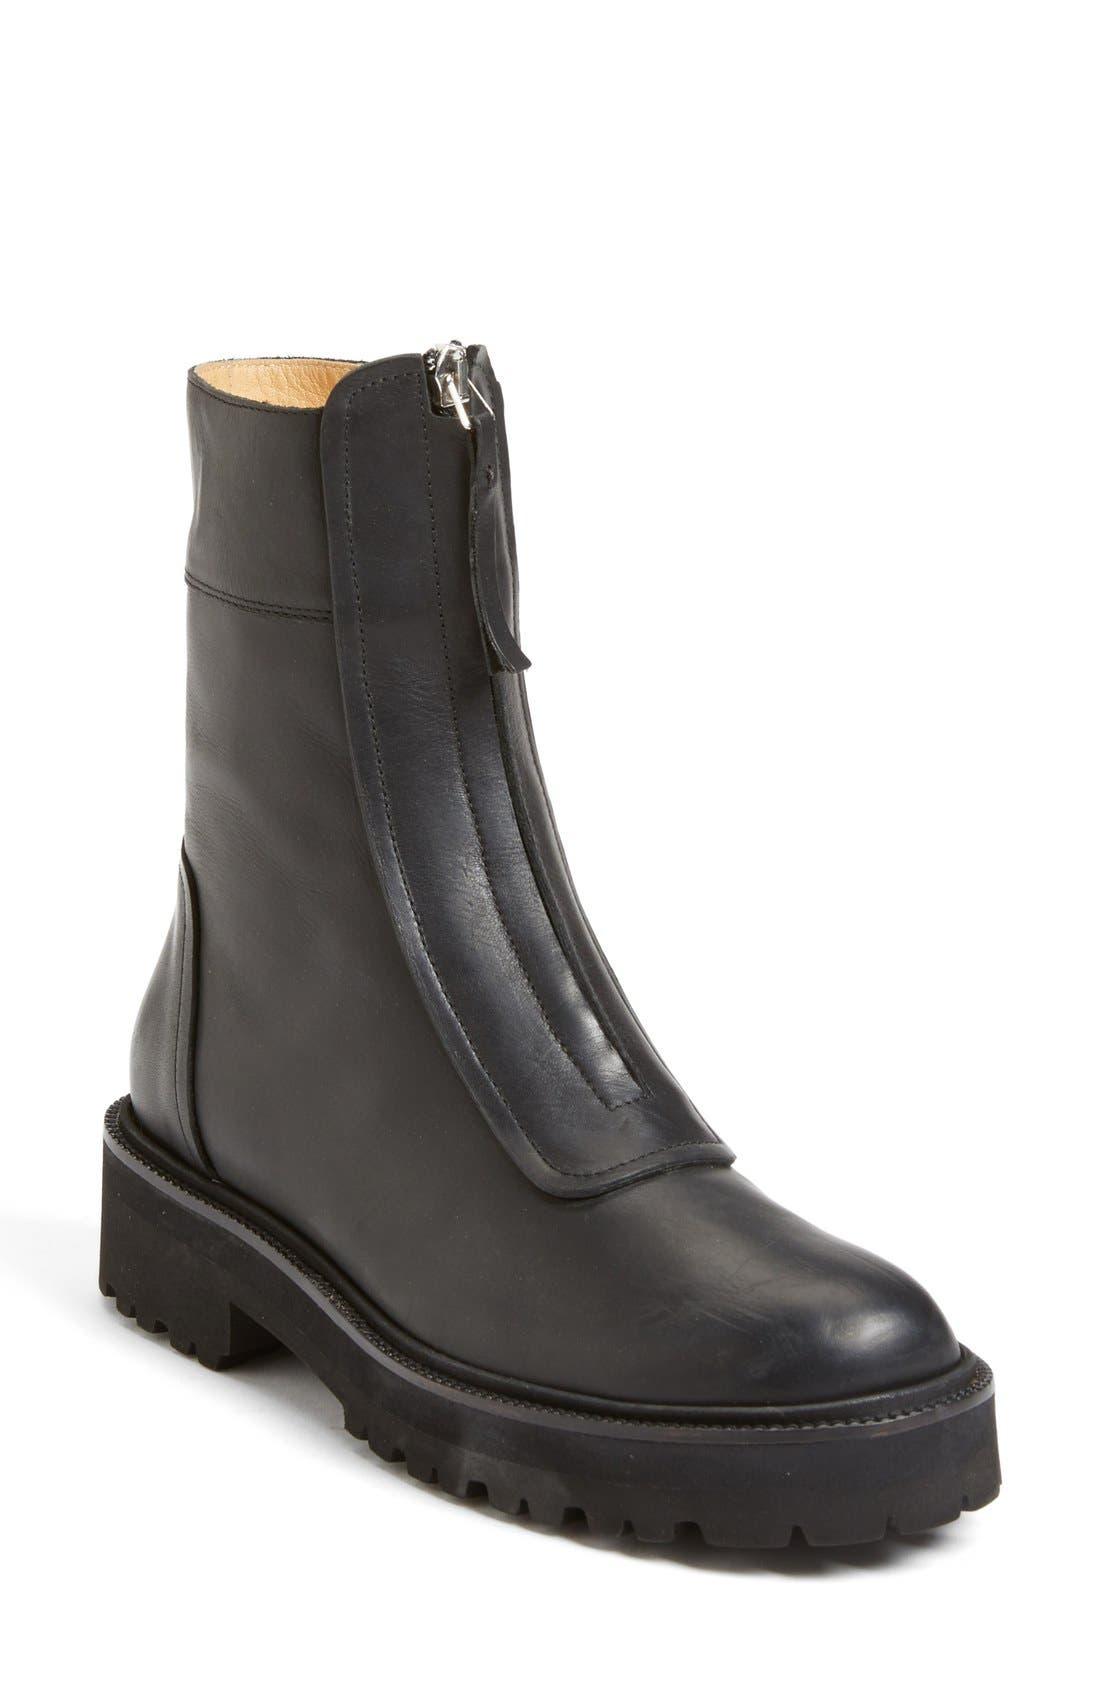 Alternate Image 1 Selected - MM6 Maison Margiela Zip Chelsea Boot (Women)